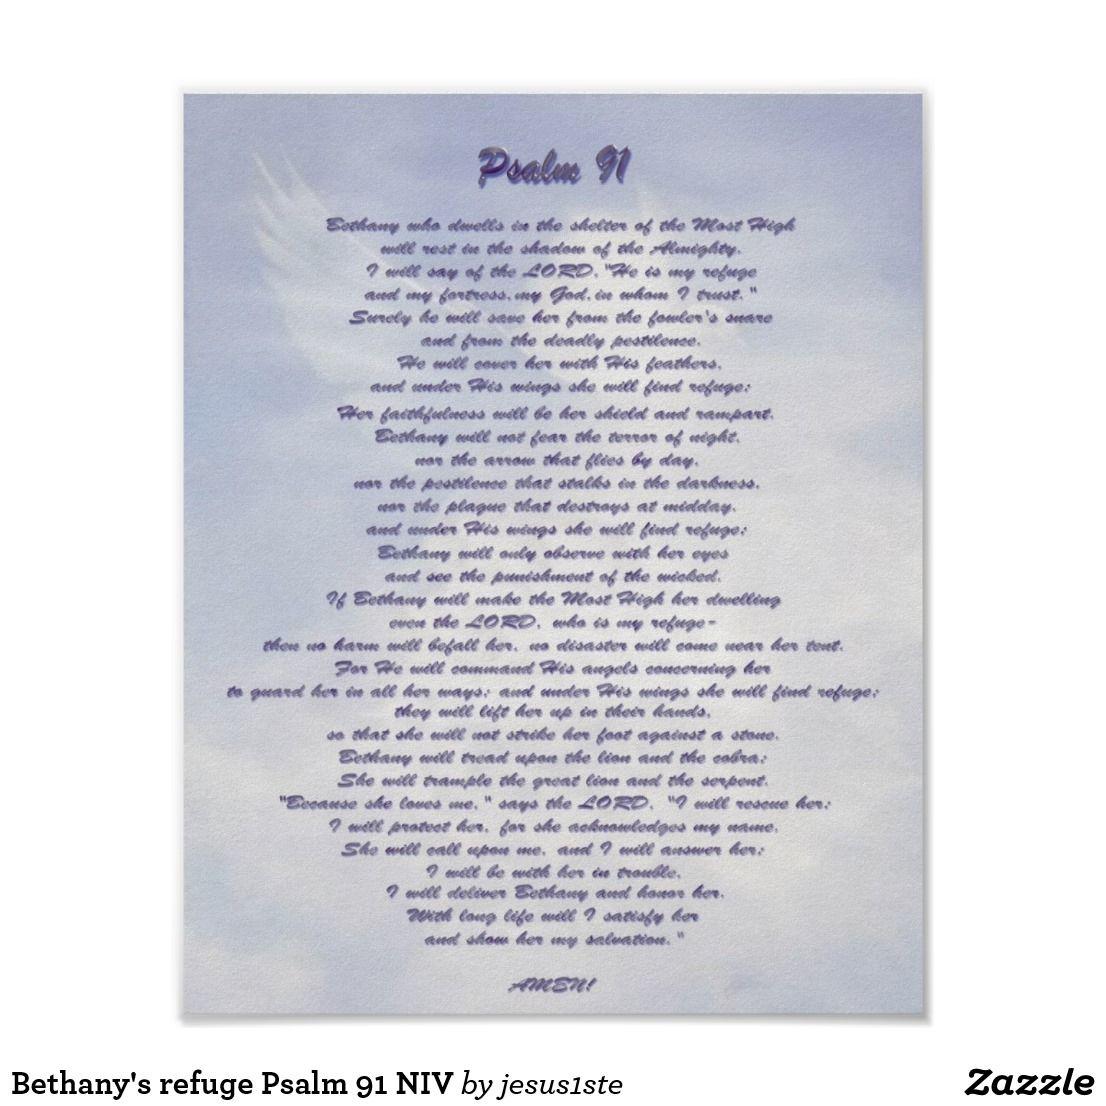 Bethany's refuge Psalm 91 NIV Poster   Zazzle com   All Erte   Psalm